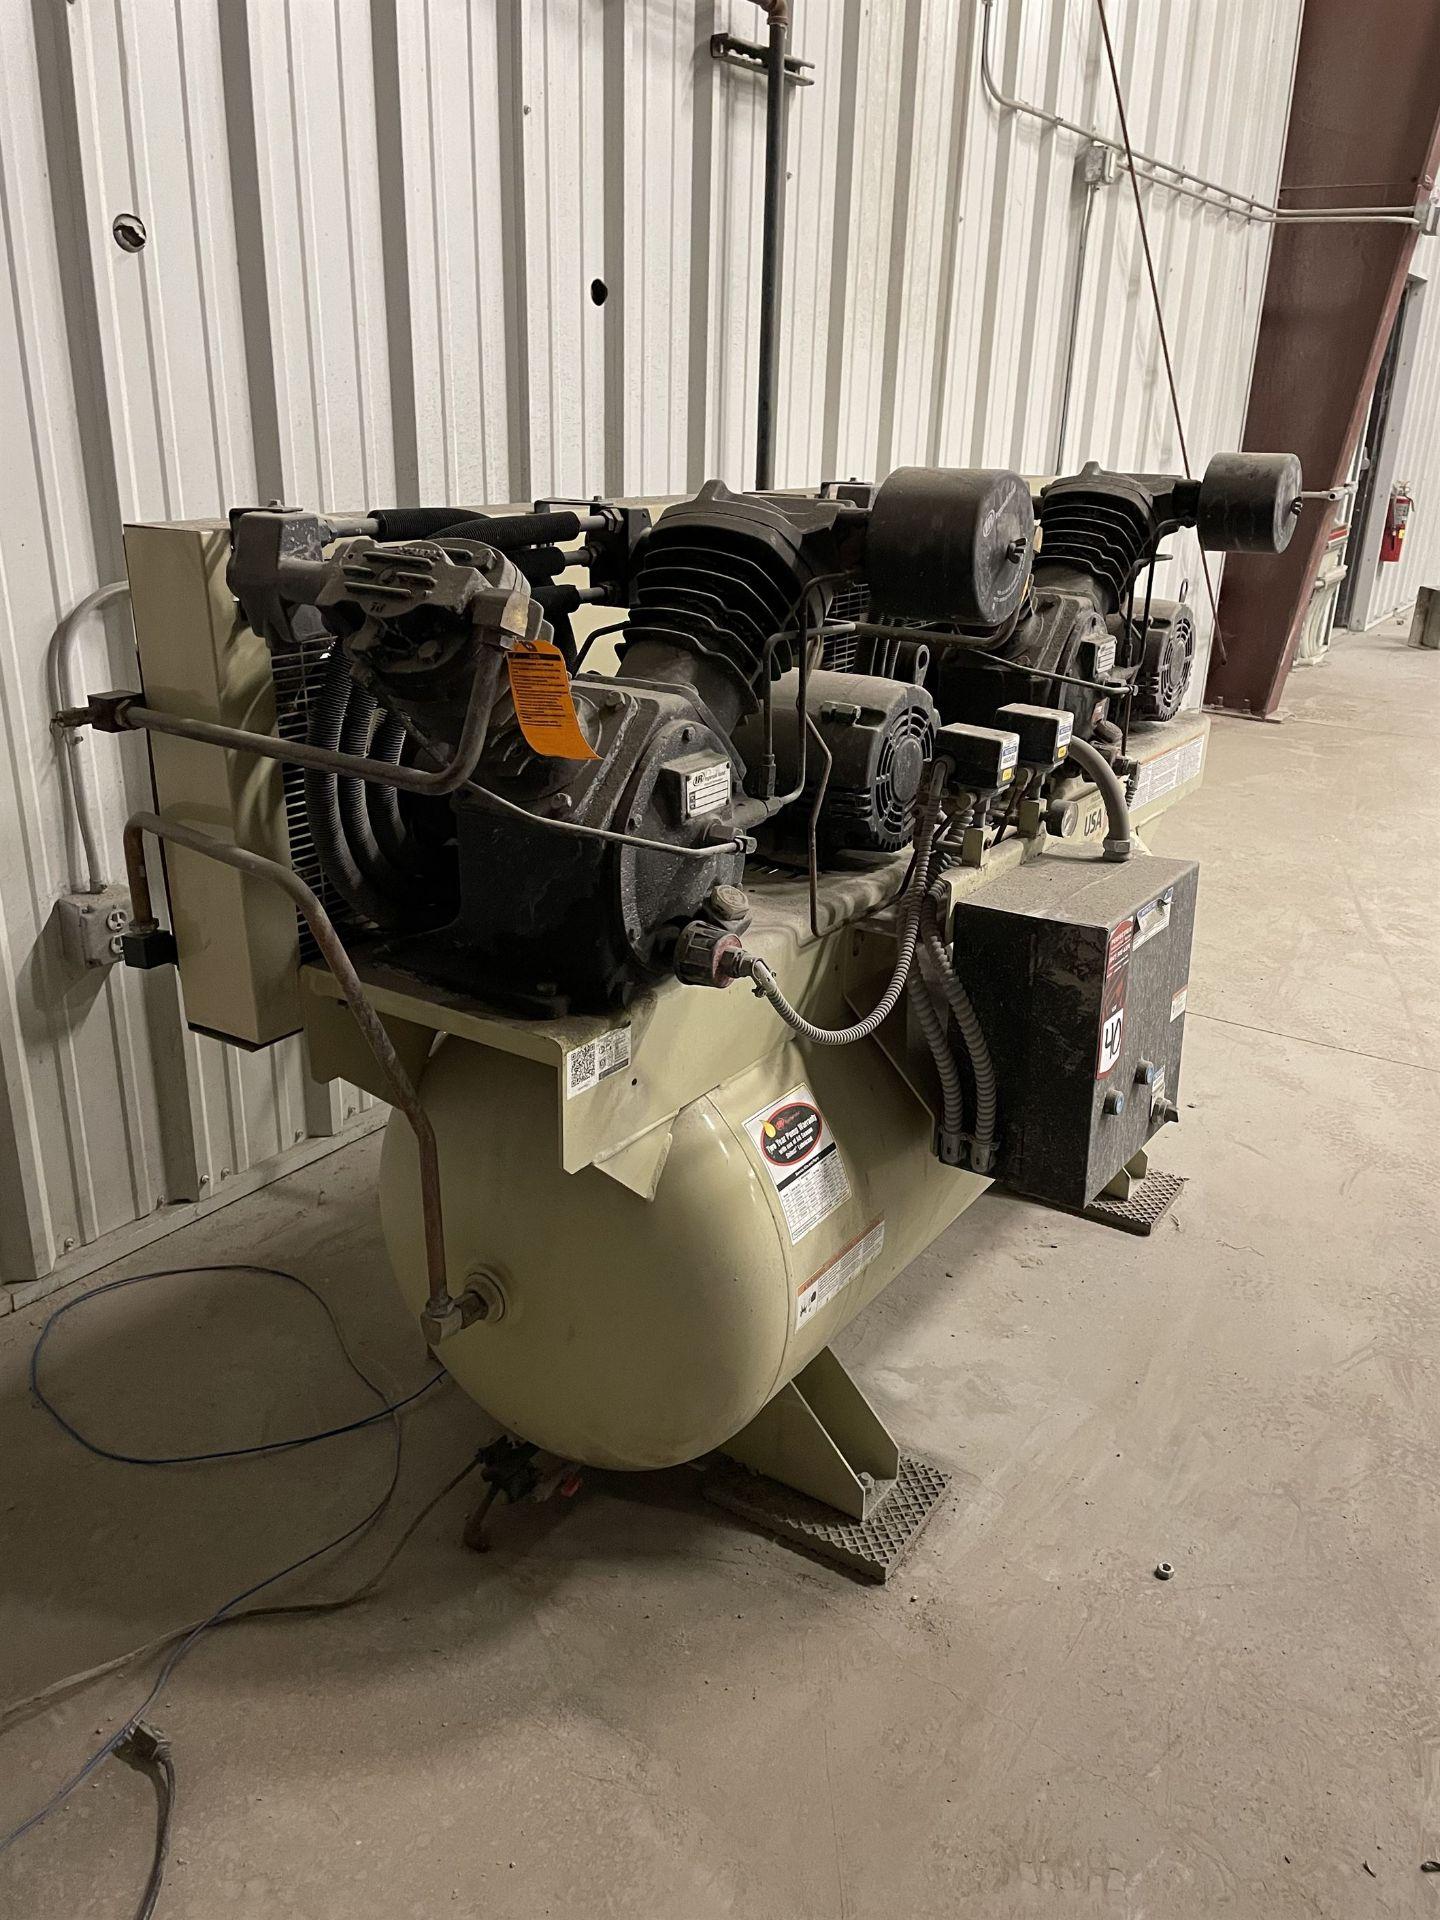 INGERSOLL RAND 2-2545E10-P 20-HP Air Compressor, s/n CBV475831 - Image 3 of 5